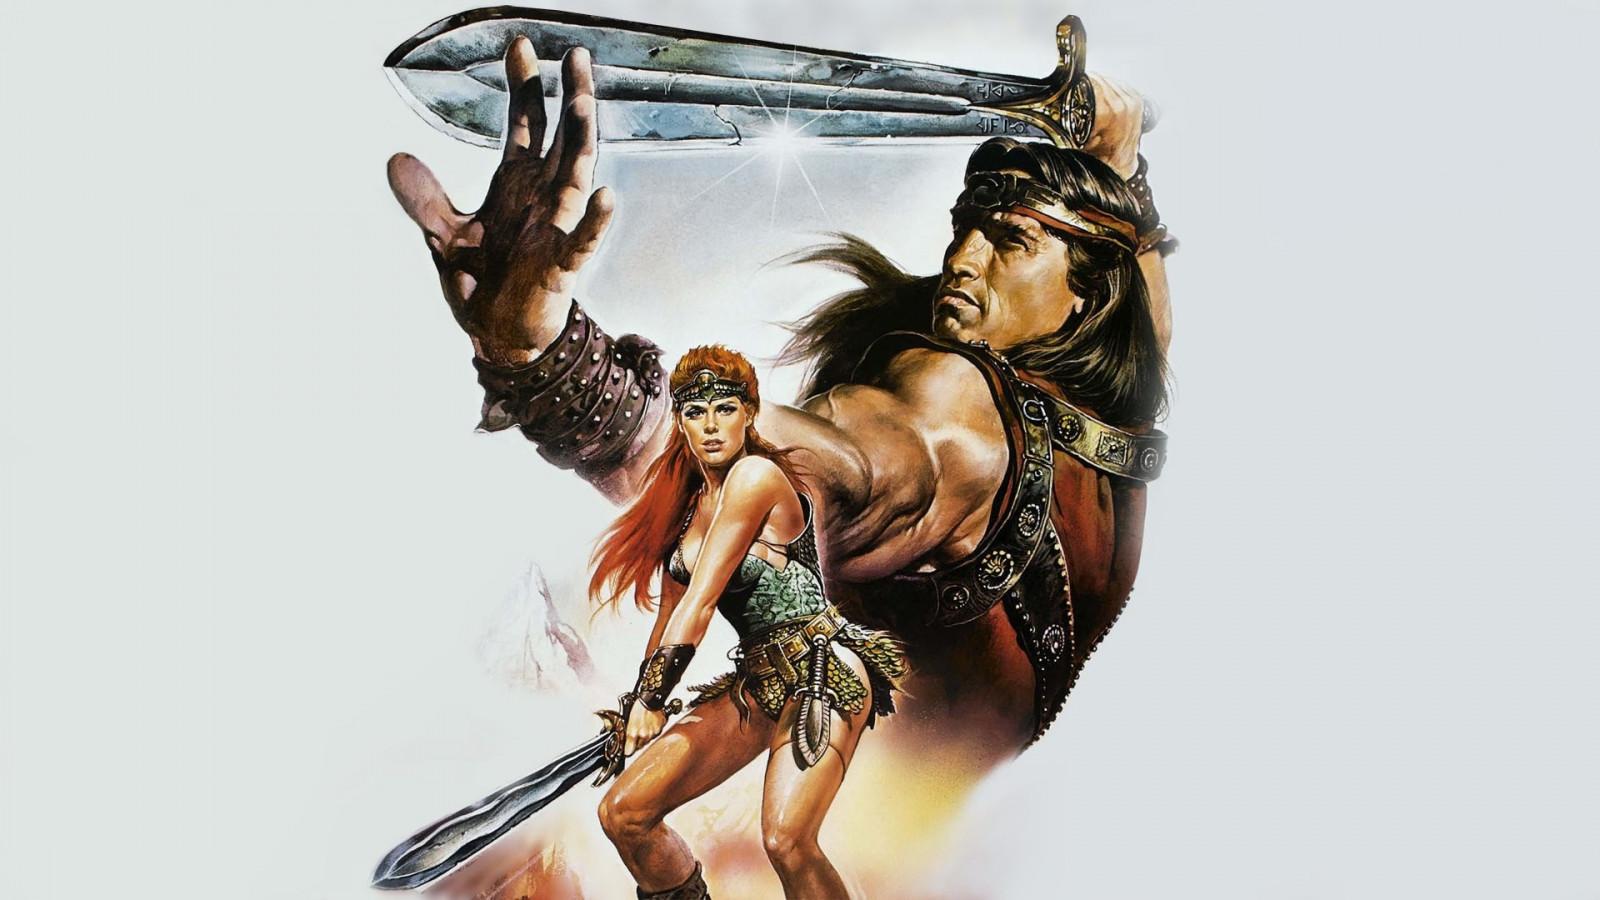 Conan the Barbarian (1982 film) - Wikipedia Conan the barbarian pictures